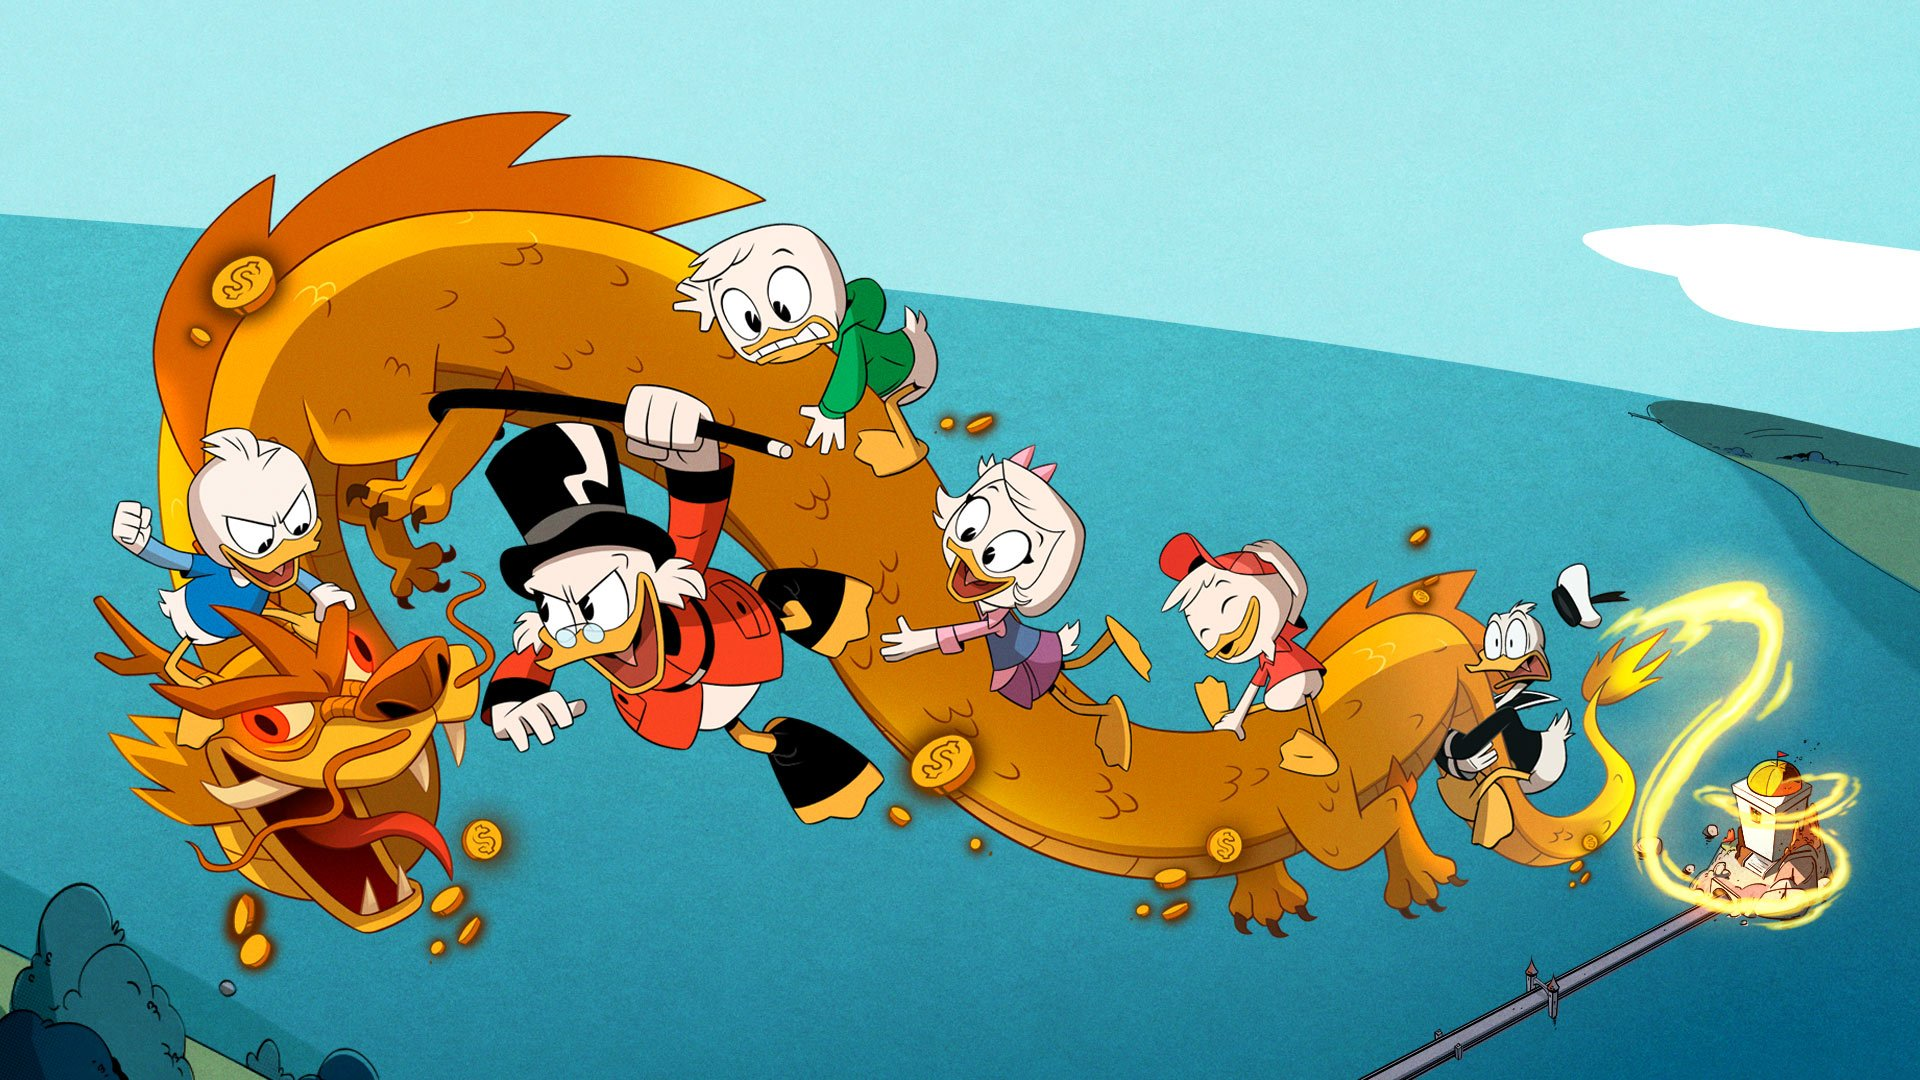 Disney game ideas - DuckTales